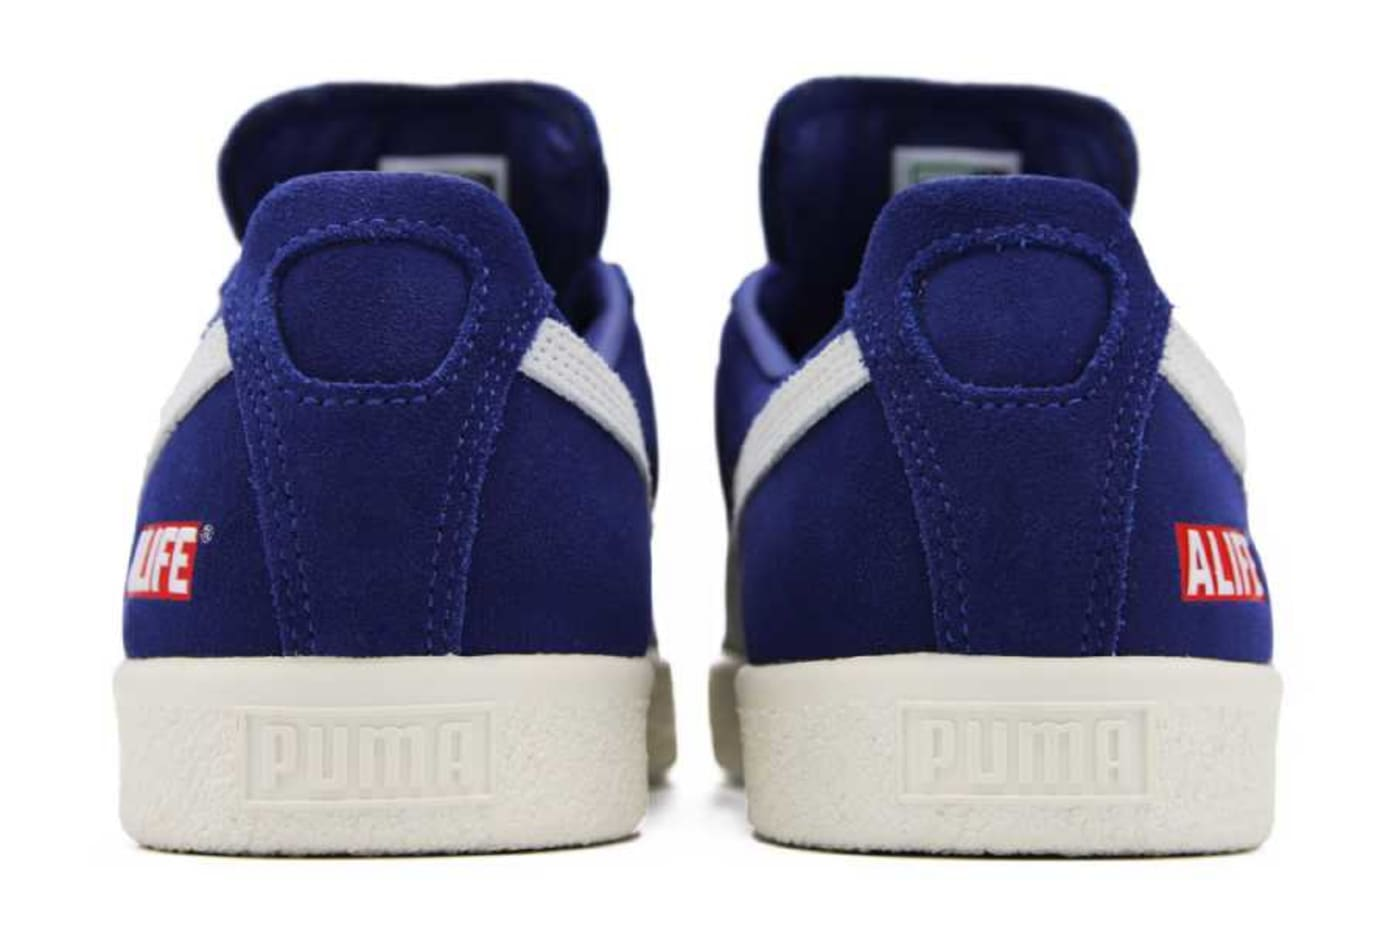 ALIFE x Puma Clyde Blue Release Date Heel